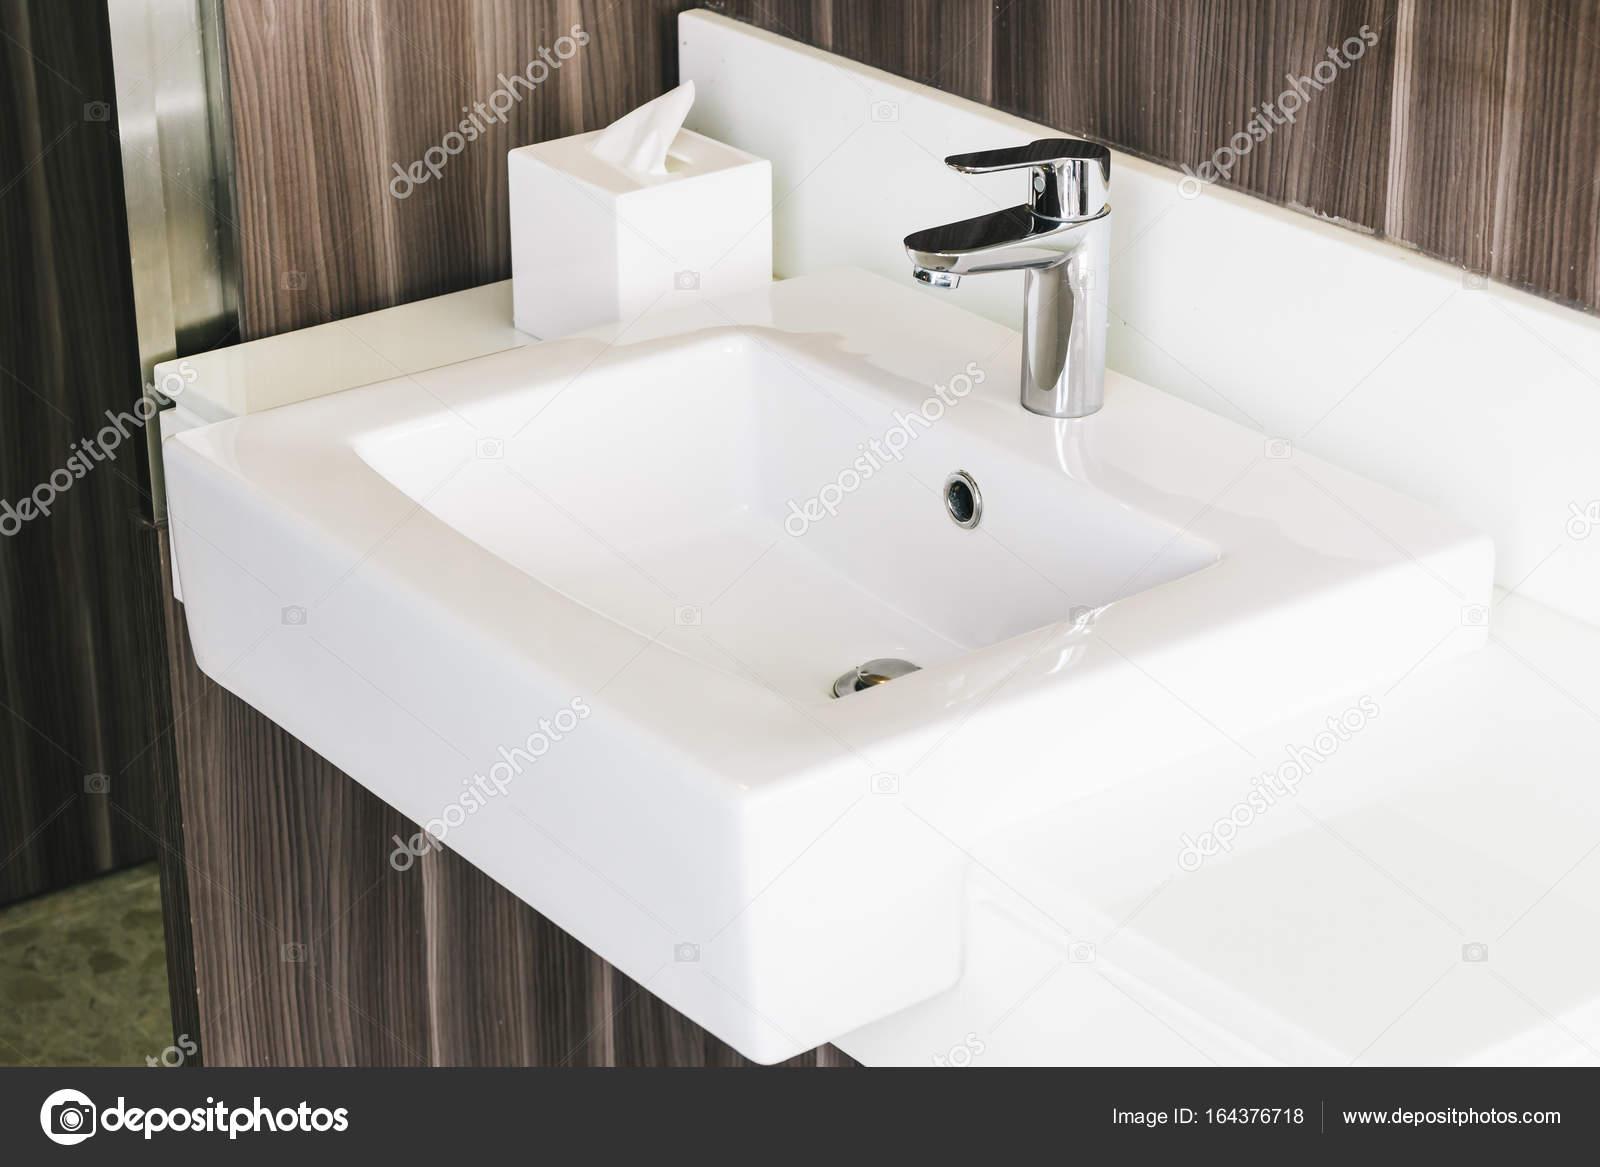 Witte moderne wastafel en kraan in de badkamer u stockfoto